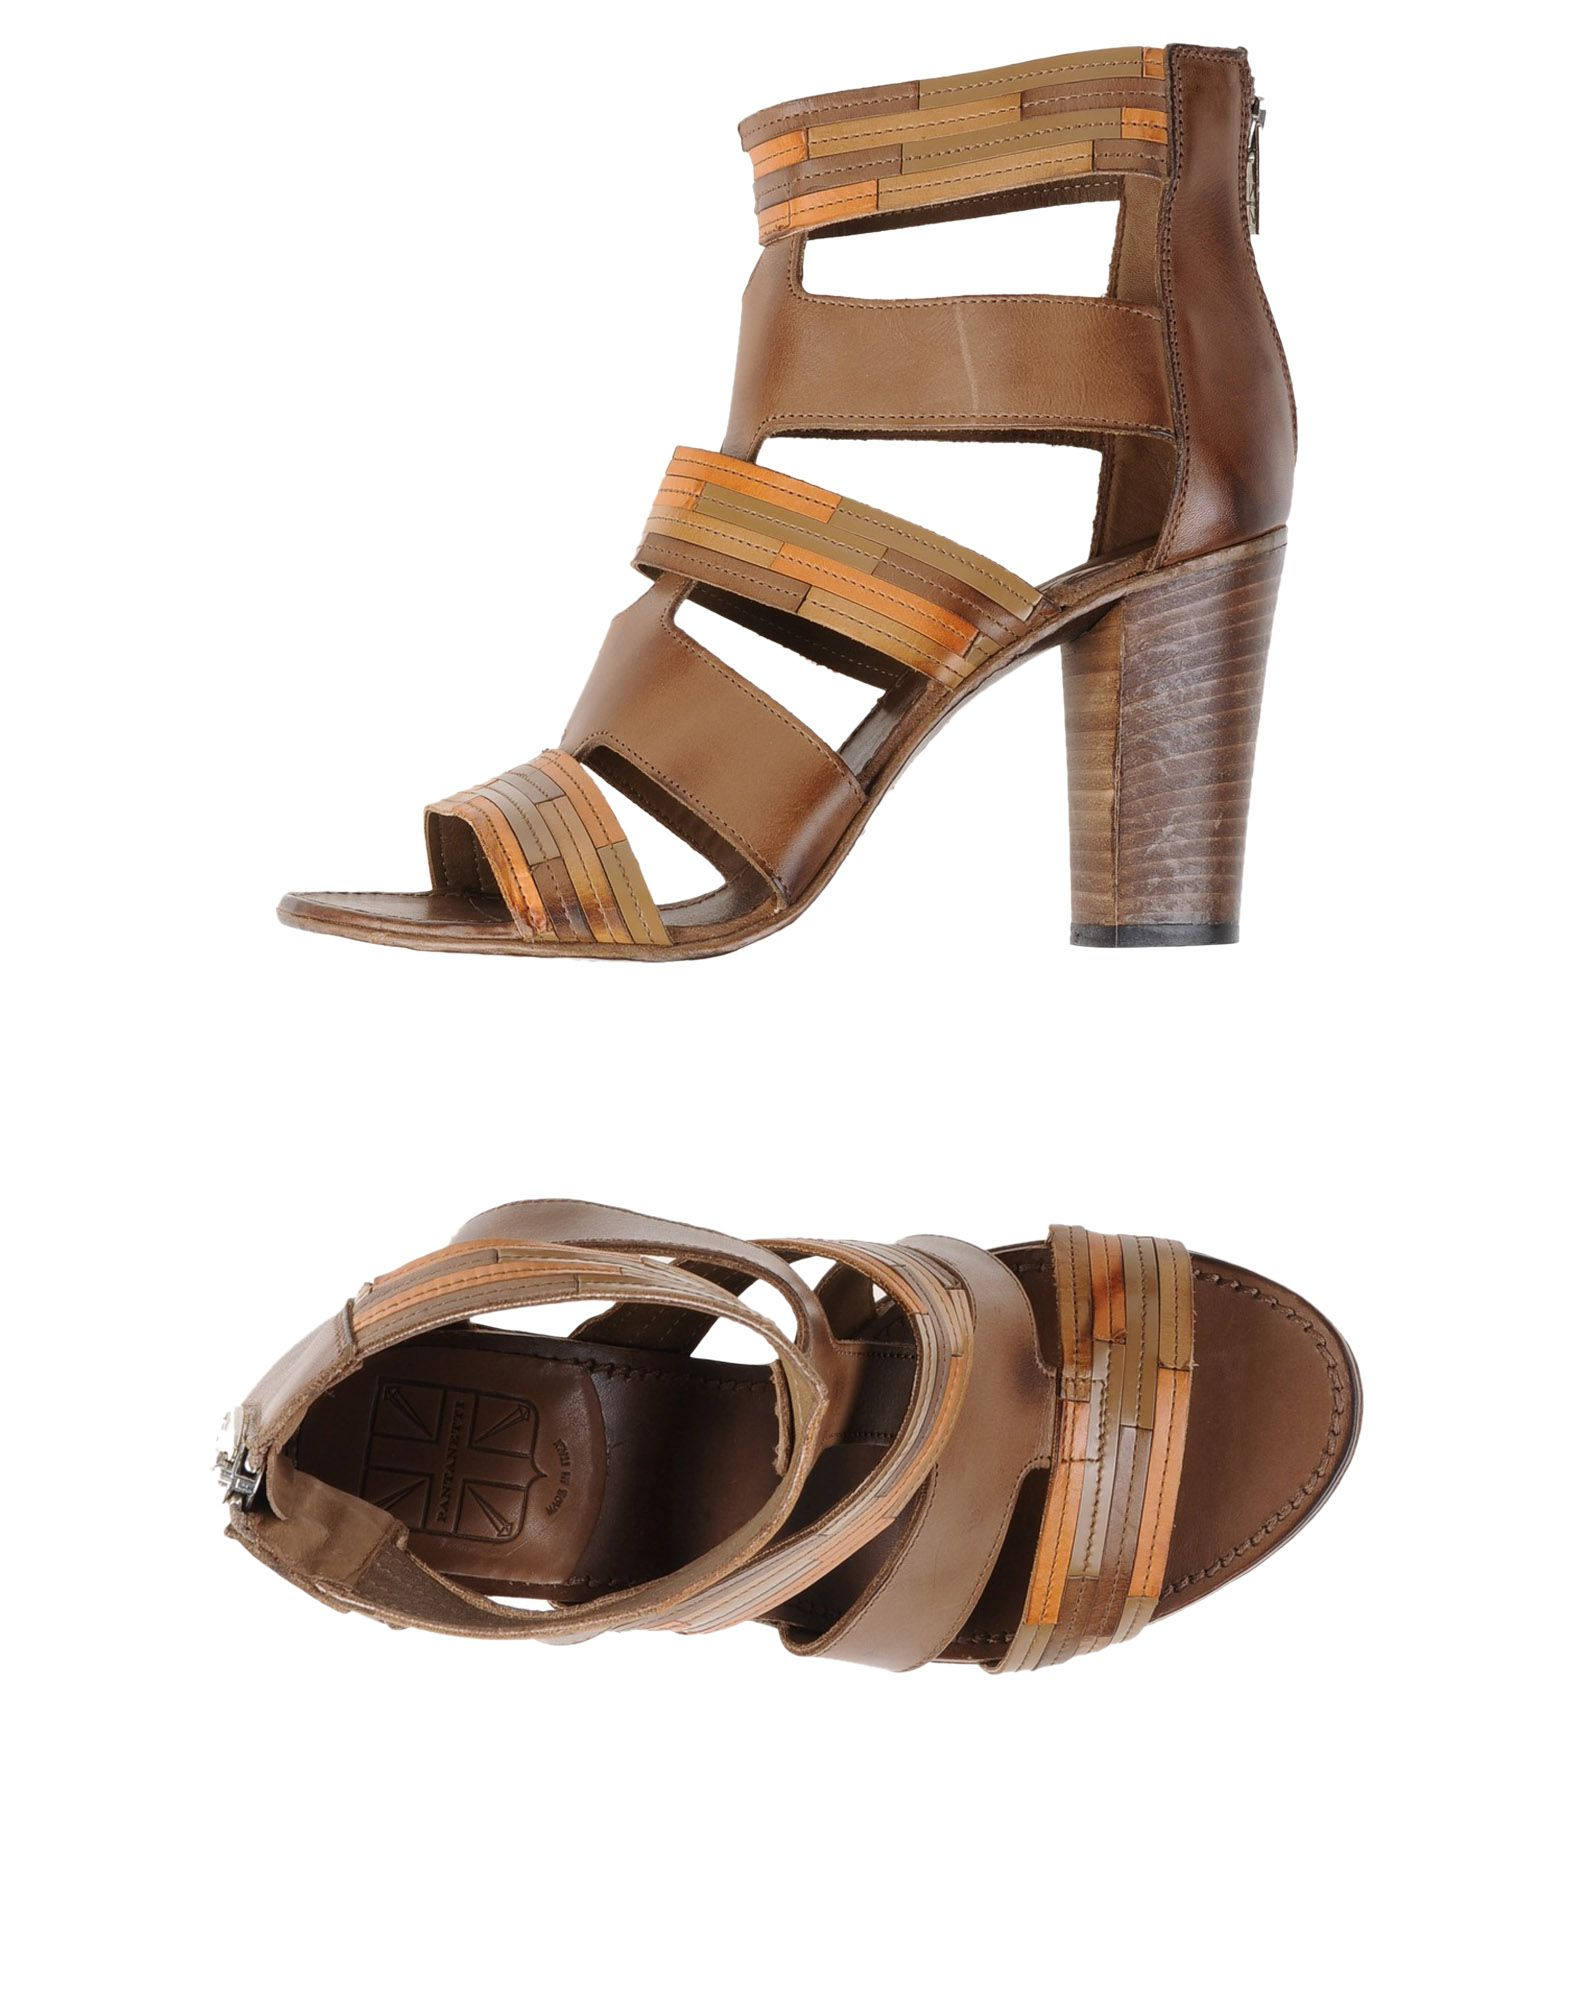 Stilvolle billige Schuhe Damen Pantanetti Sandalen Damen Schuhe  44837908JB 3a30cd